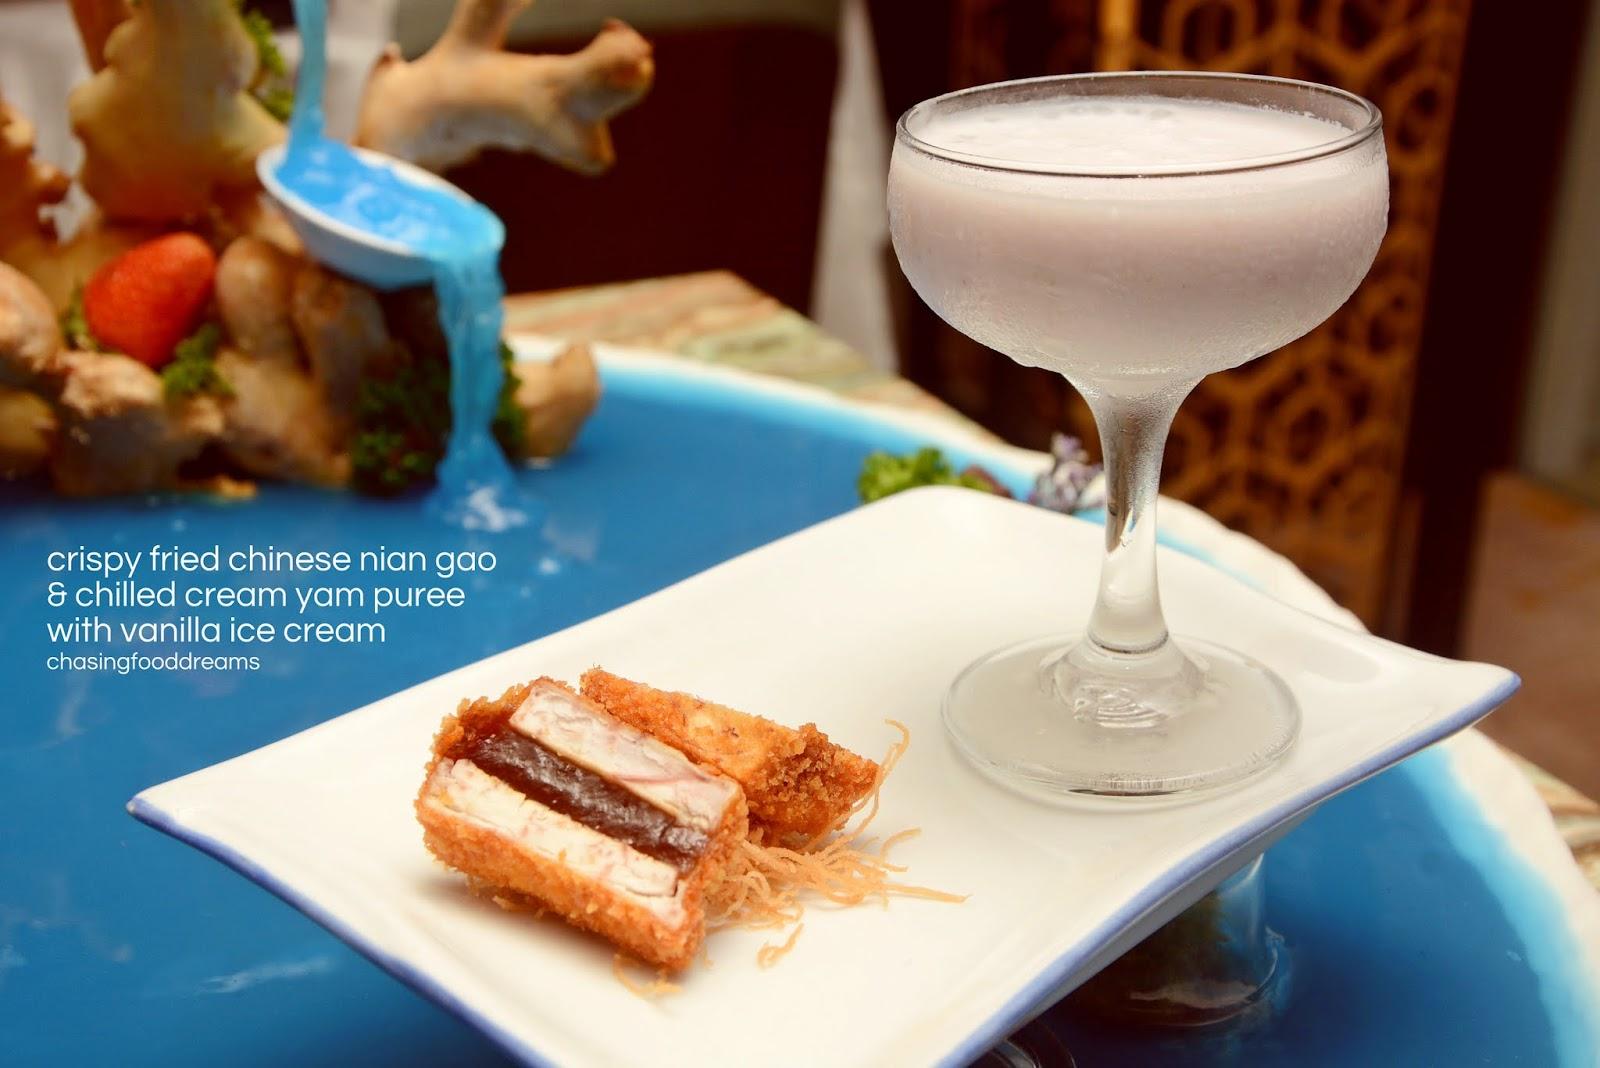 CHASING FOOD DREAMS: CNY Menu 2017 @ Toh Yuen, Hilton Petaling Jaya